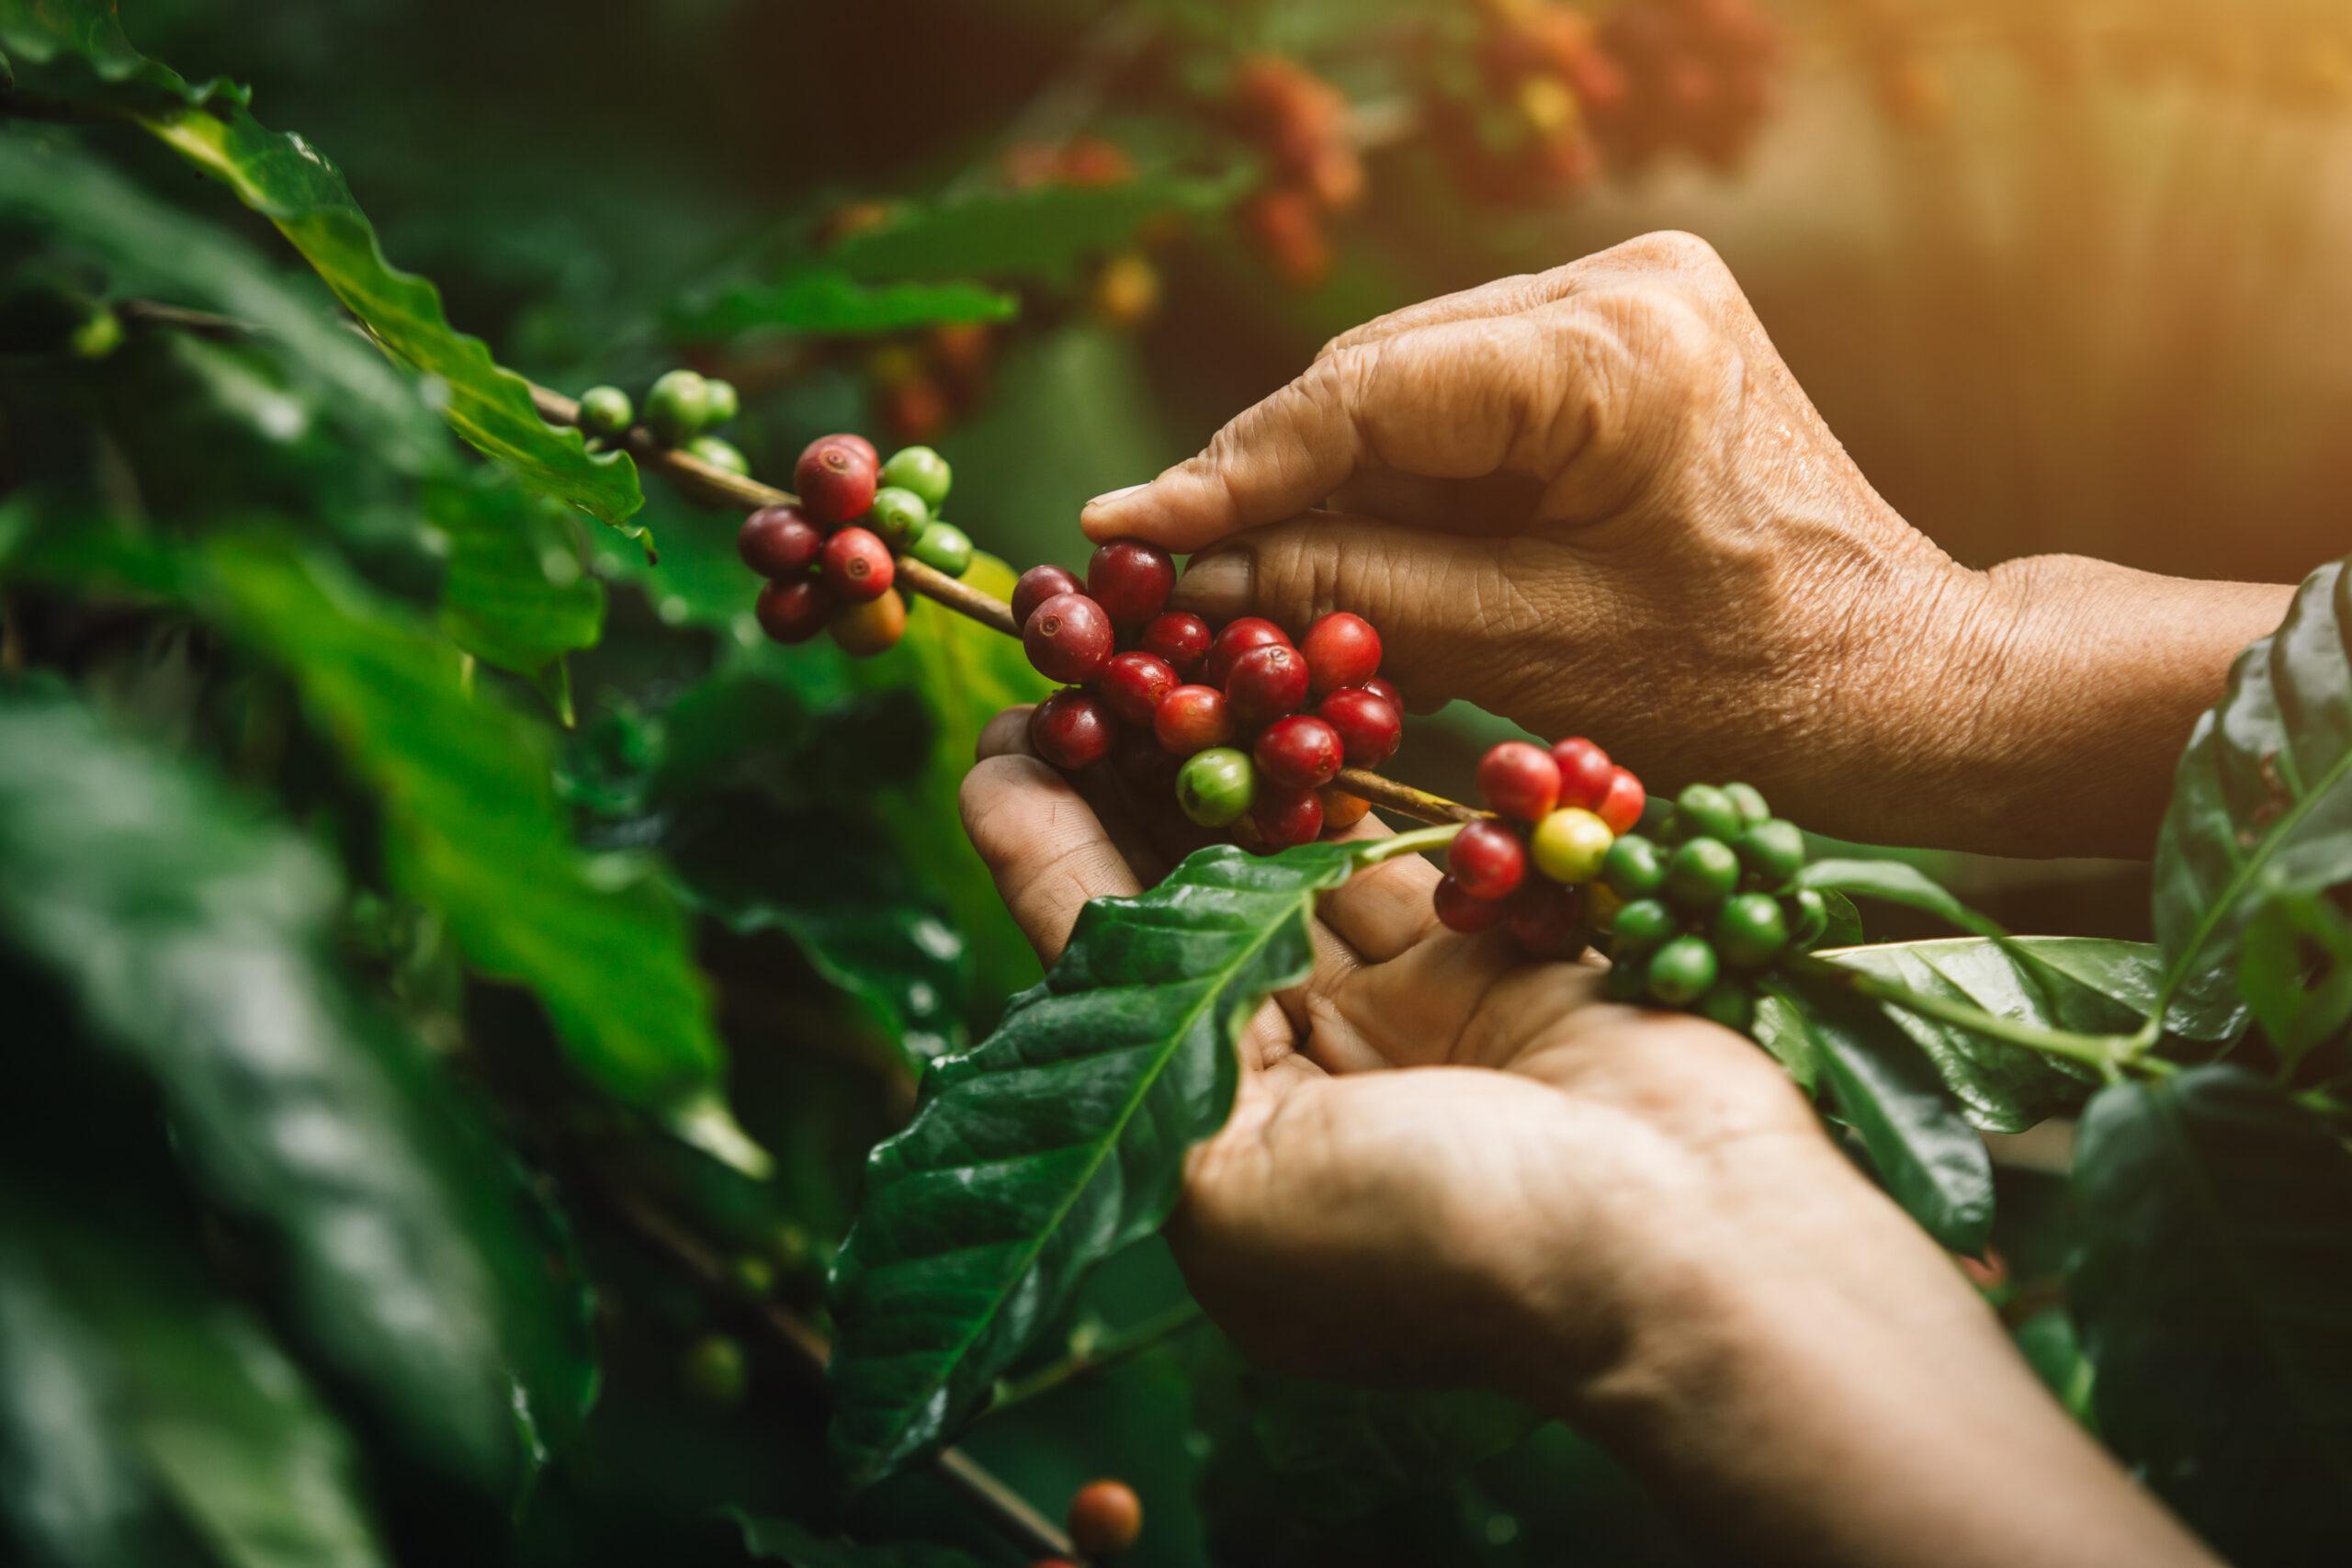 [coffee berries] Close-up arabica coffee berries with agriculturist handsNärbild på händer som skördar kaffe